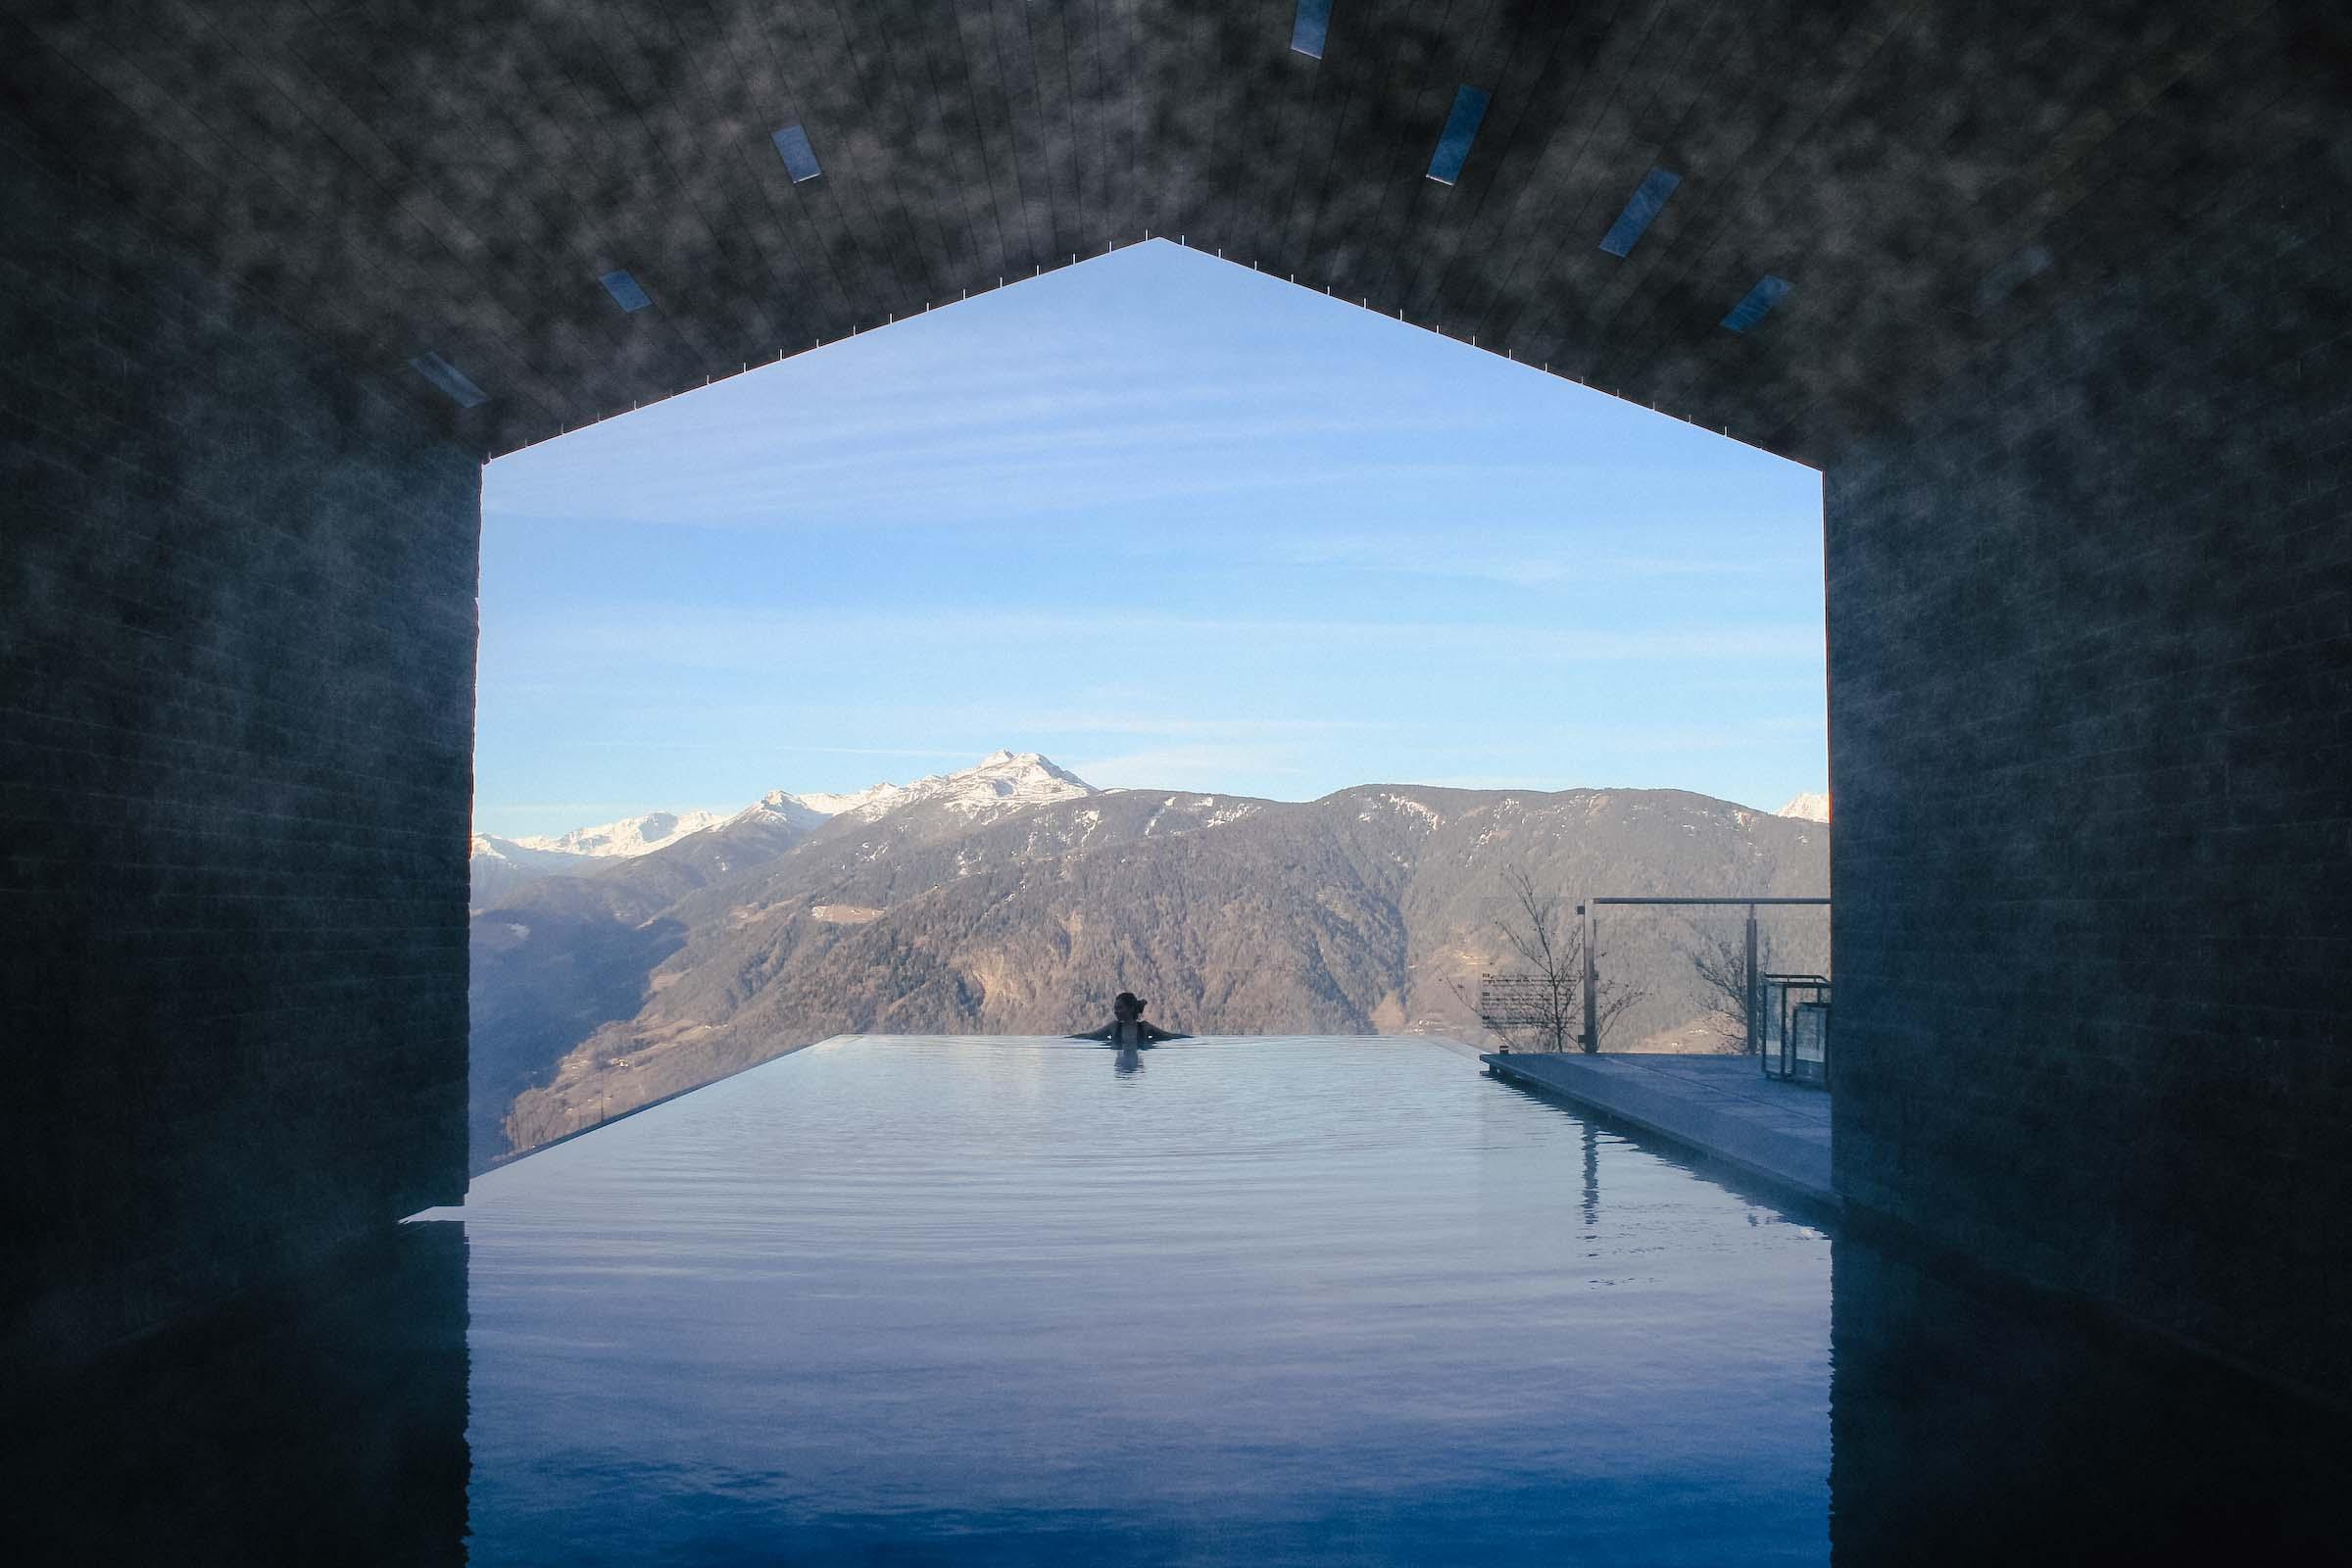 Meran hotel review miramonti boutique hotel 23timezones for Design boutique hotel meran